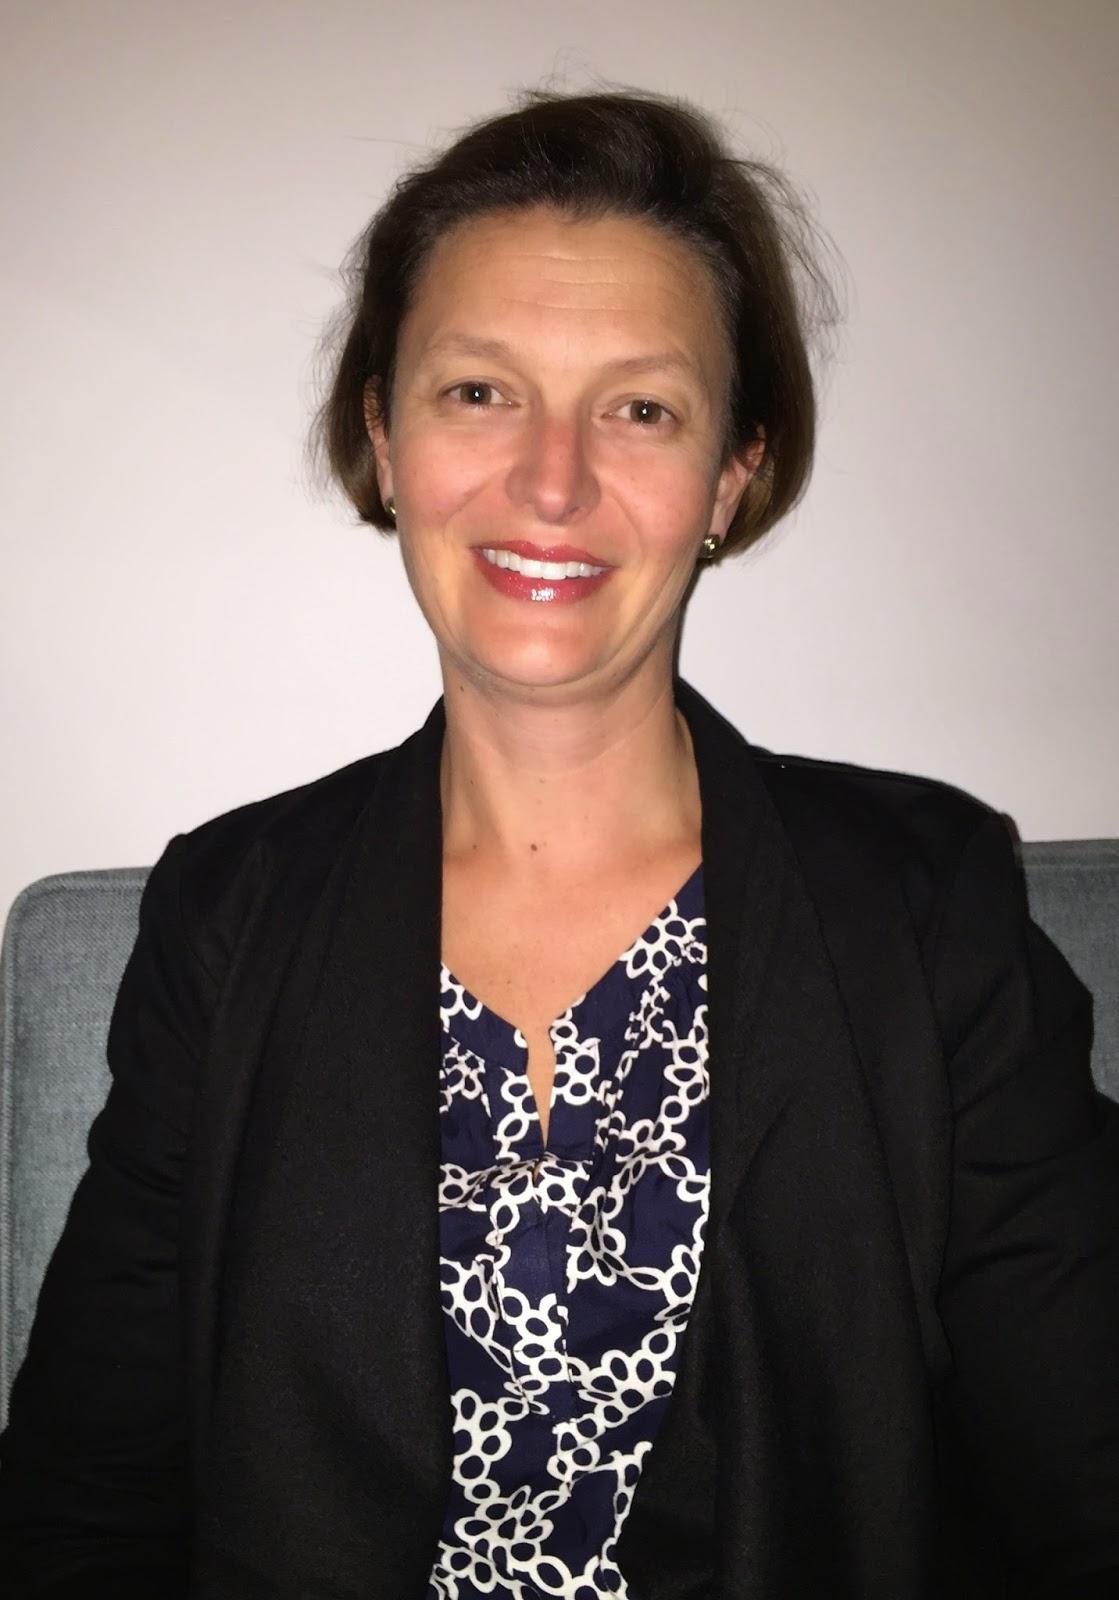 Catriona Halliday mycologist